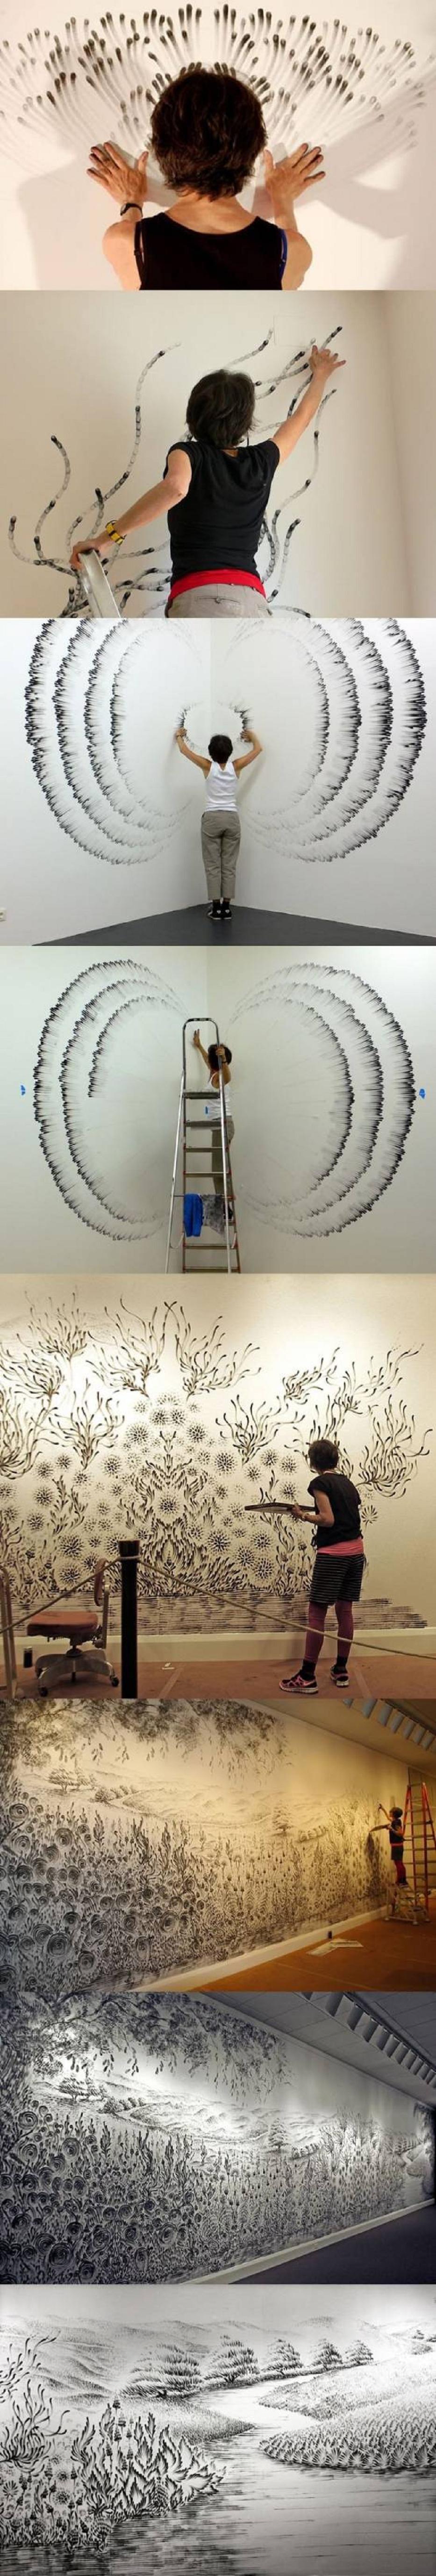 Charcoal finger art